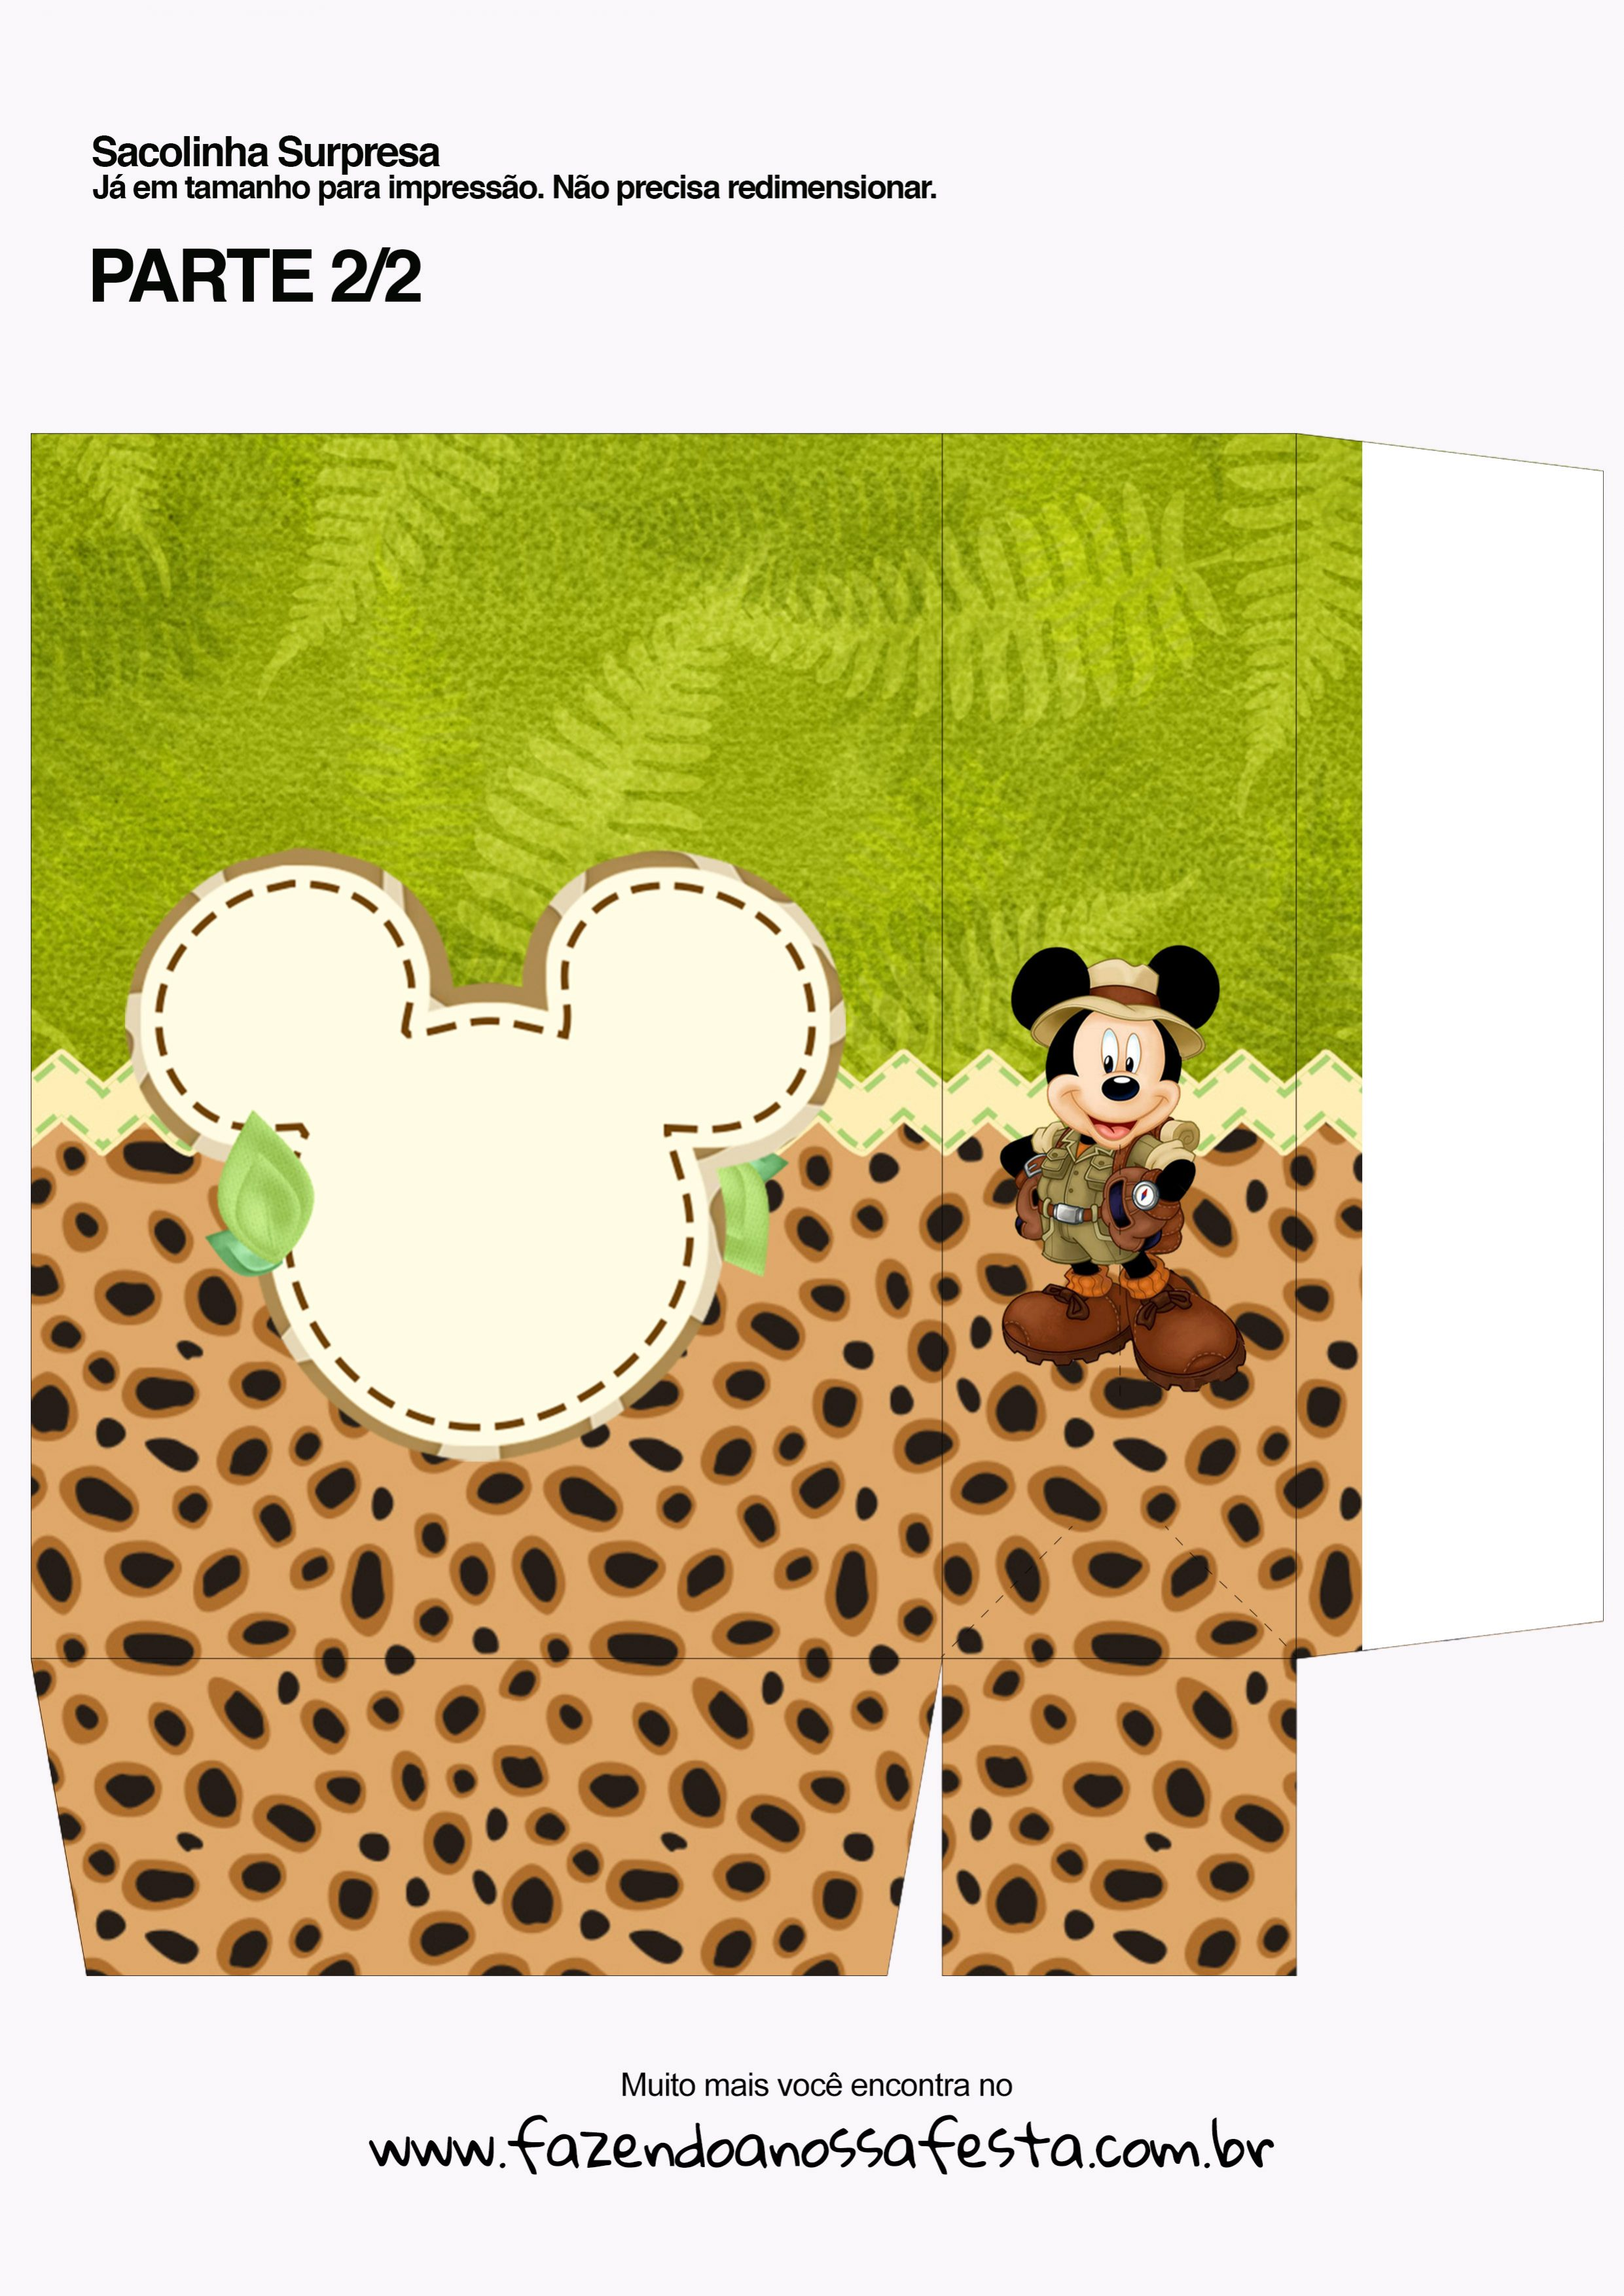 Sacolinha Surpresa Mickey Safari - parte 2